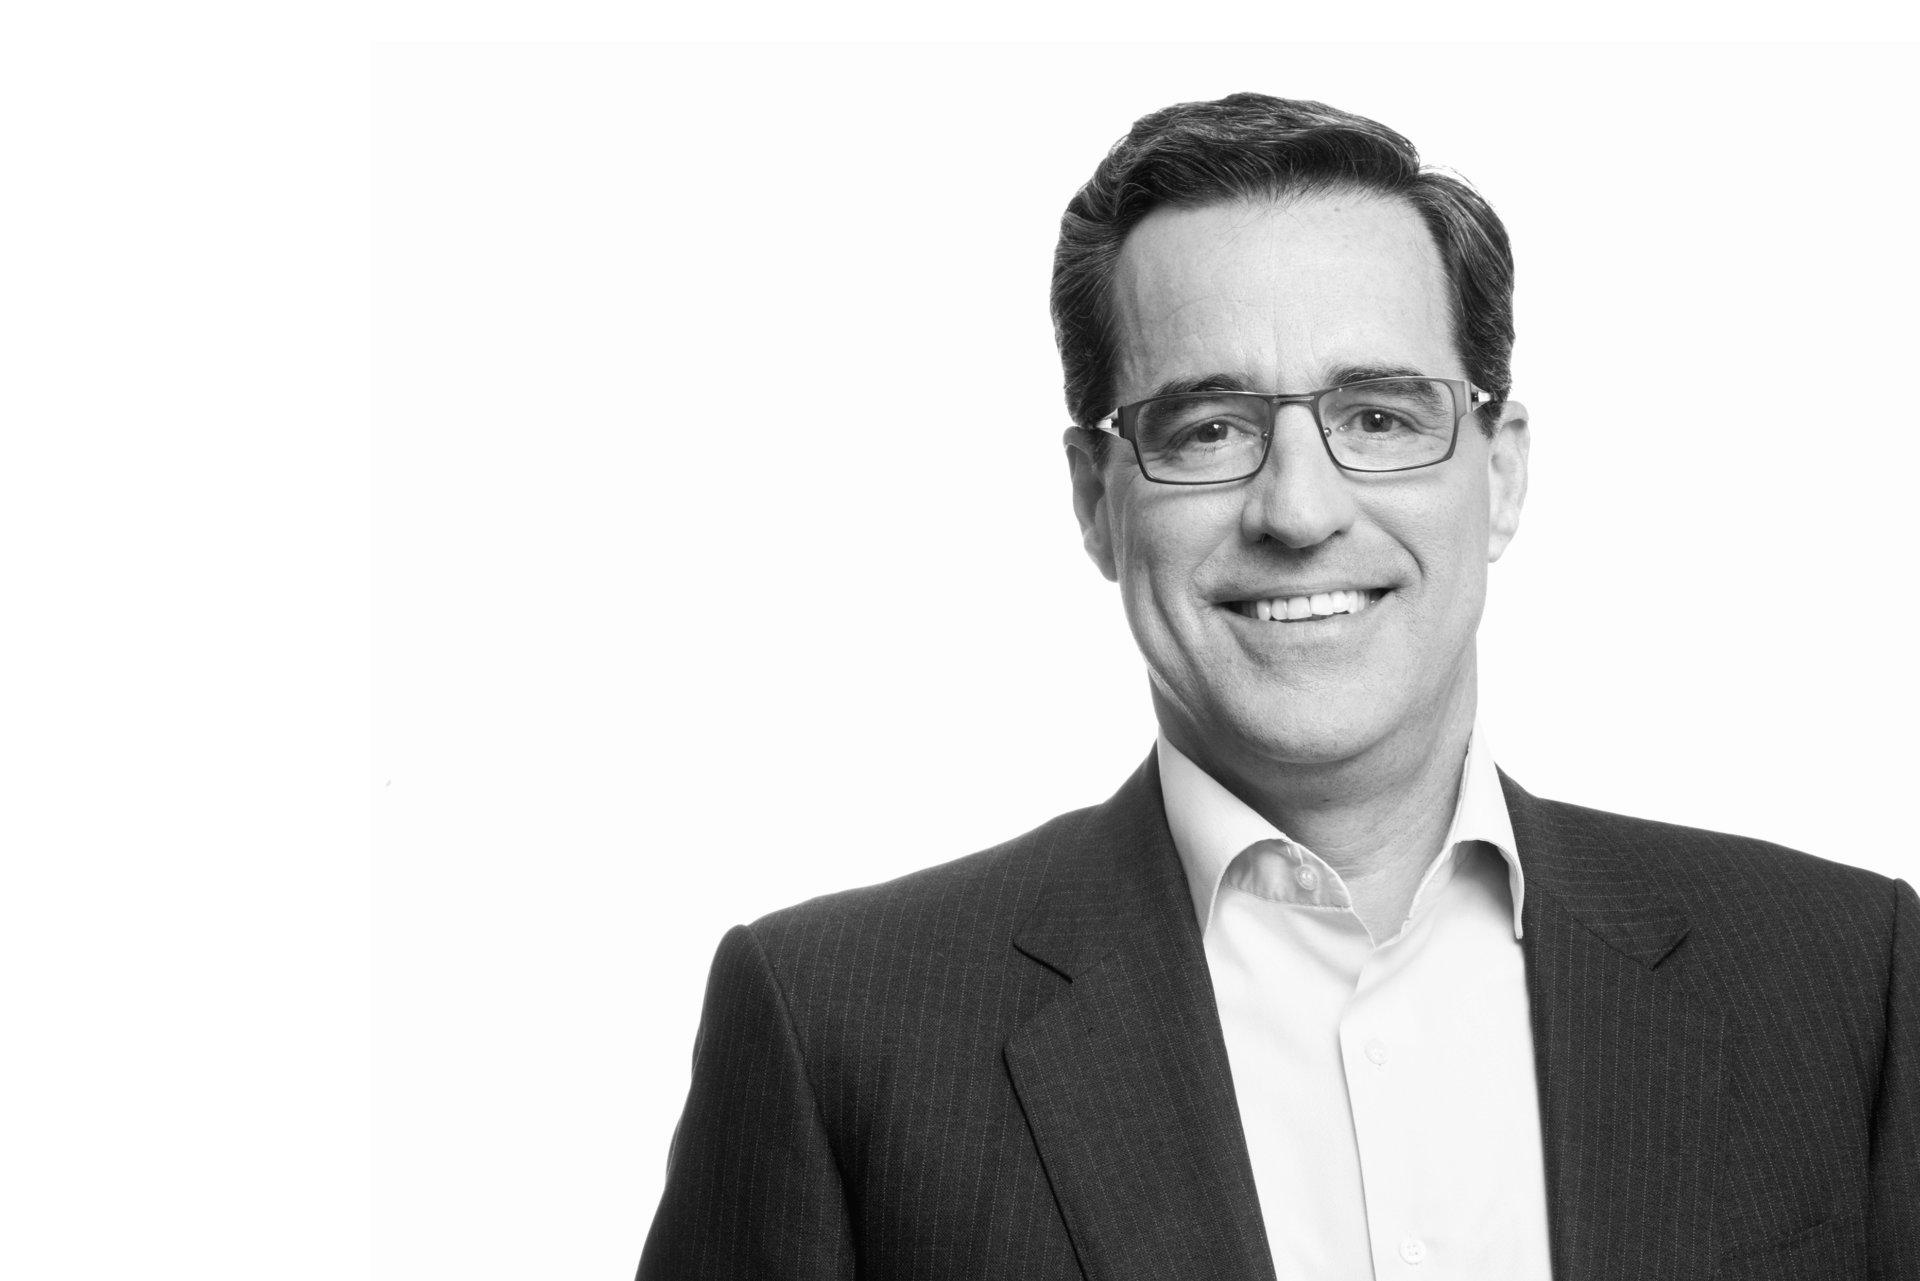 https://accionistaseinversores.bbva.com/wp-content/uploads/2017/06/Jaime-Saenz-de-Tejada-BBVA.jpg